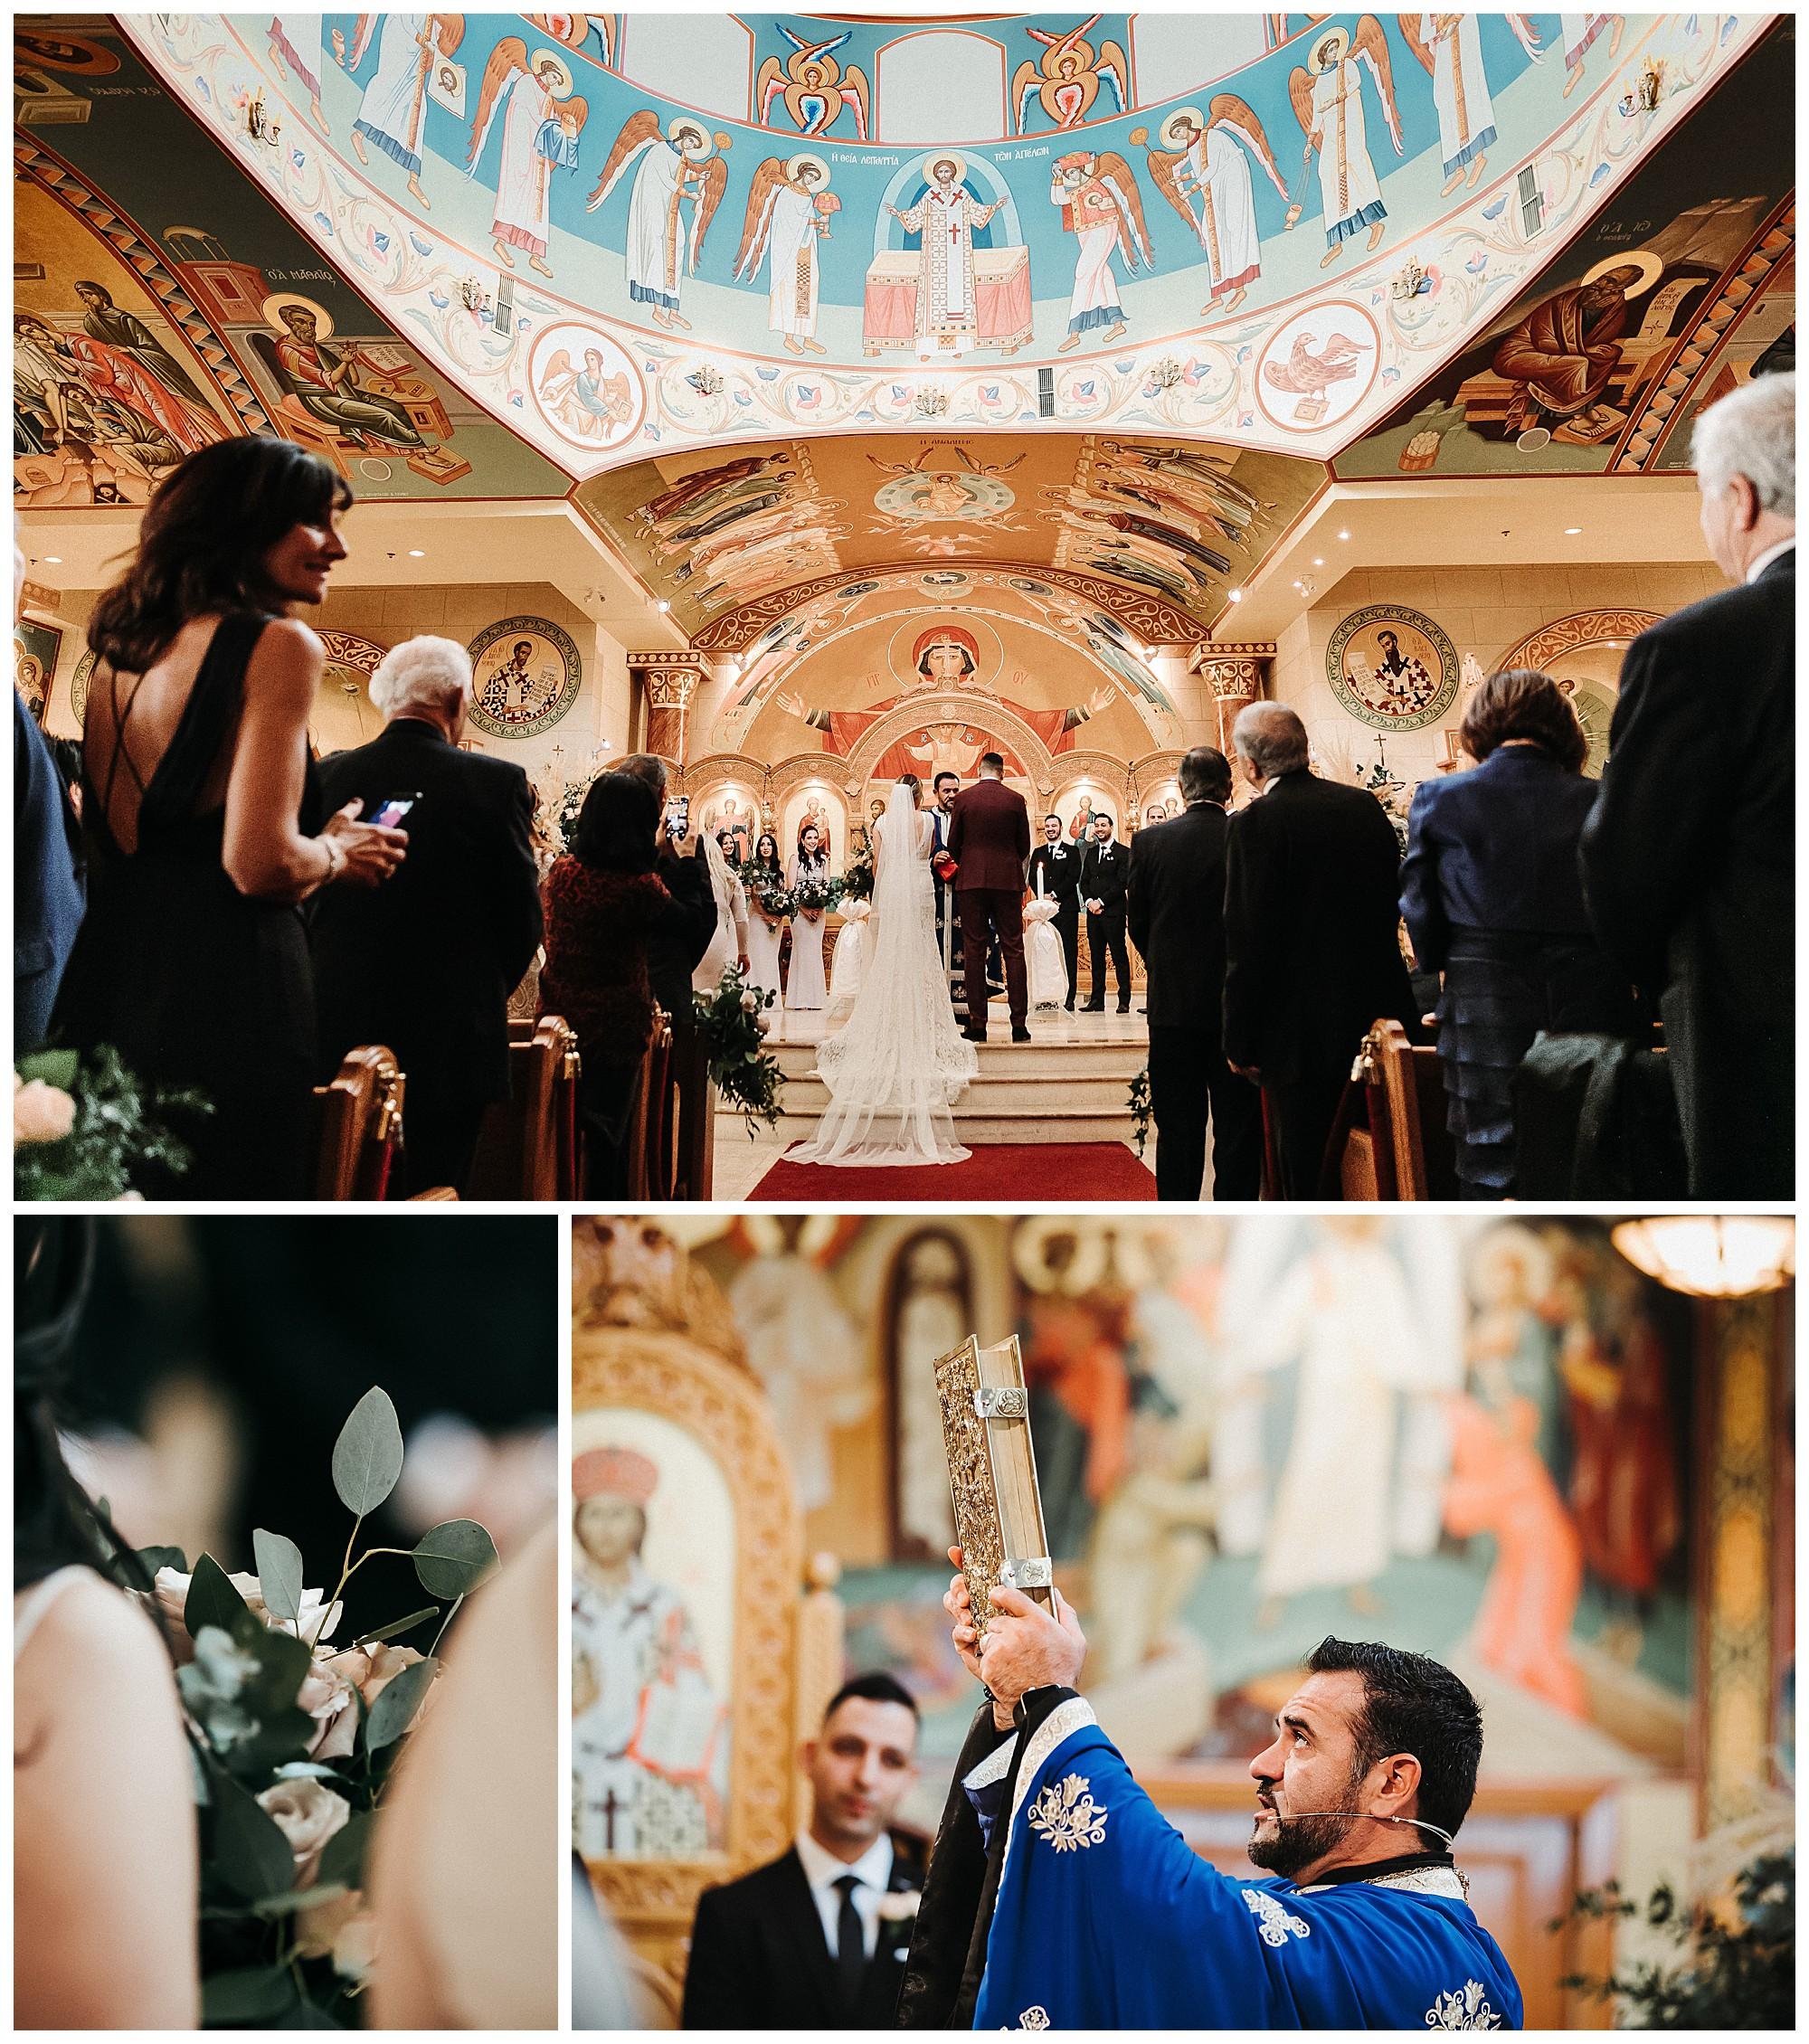 Joanna-Christos-Grand-Luxe-Wedding-Photos-Mint-Room-Toronto-VanDaele-Russell_0072.jpg